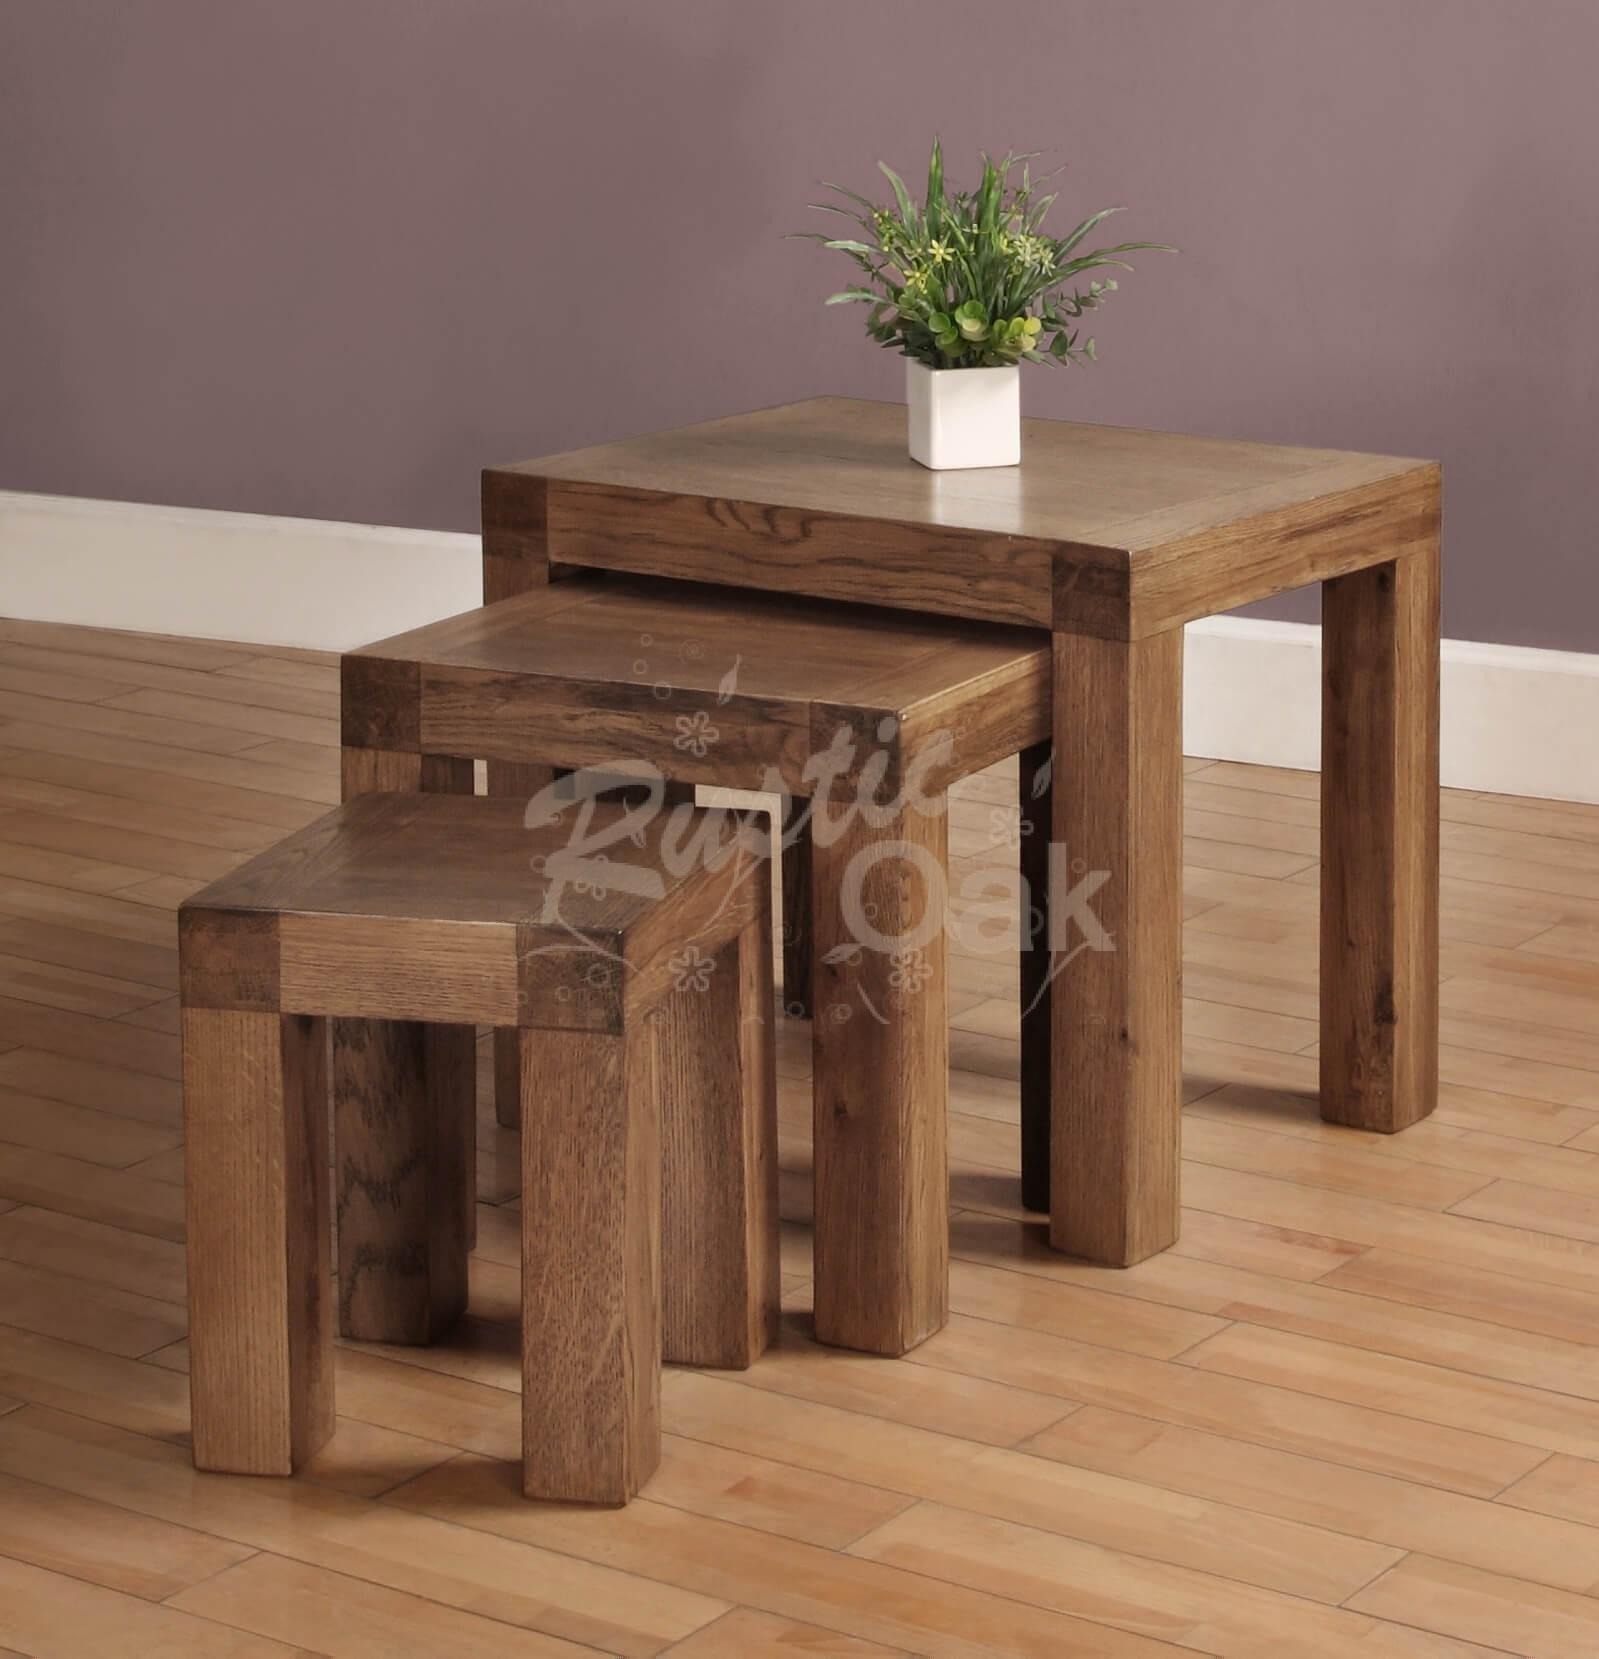 santana nest of 3 tables - rustic oak furniture